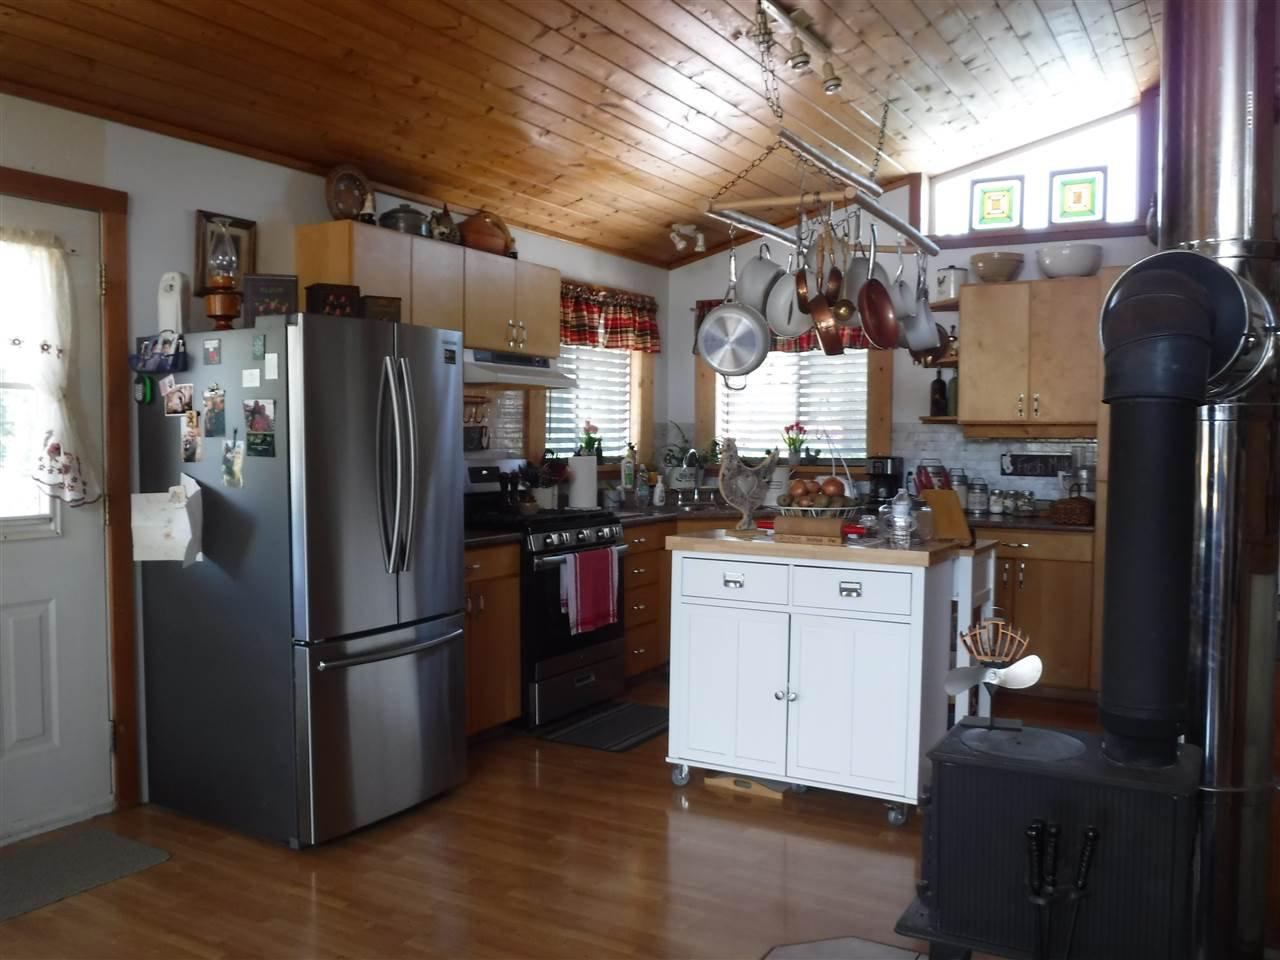 Photo 21: Photos: 3126 ELSEY Road in Williams Lake: Williams Lake - Rural West House for sale (Williams Lake (Zone 27))  : MLS®# R2467730